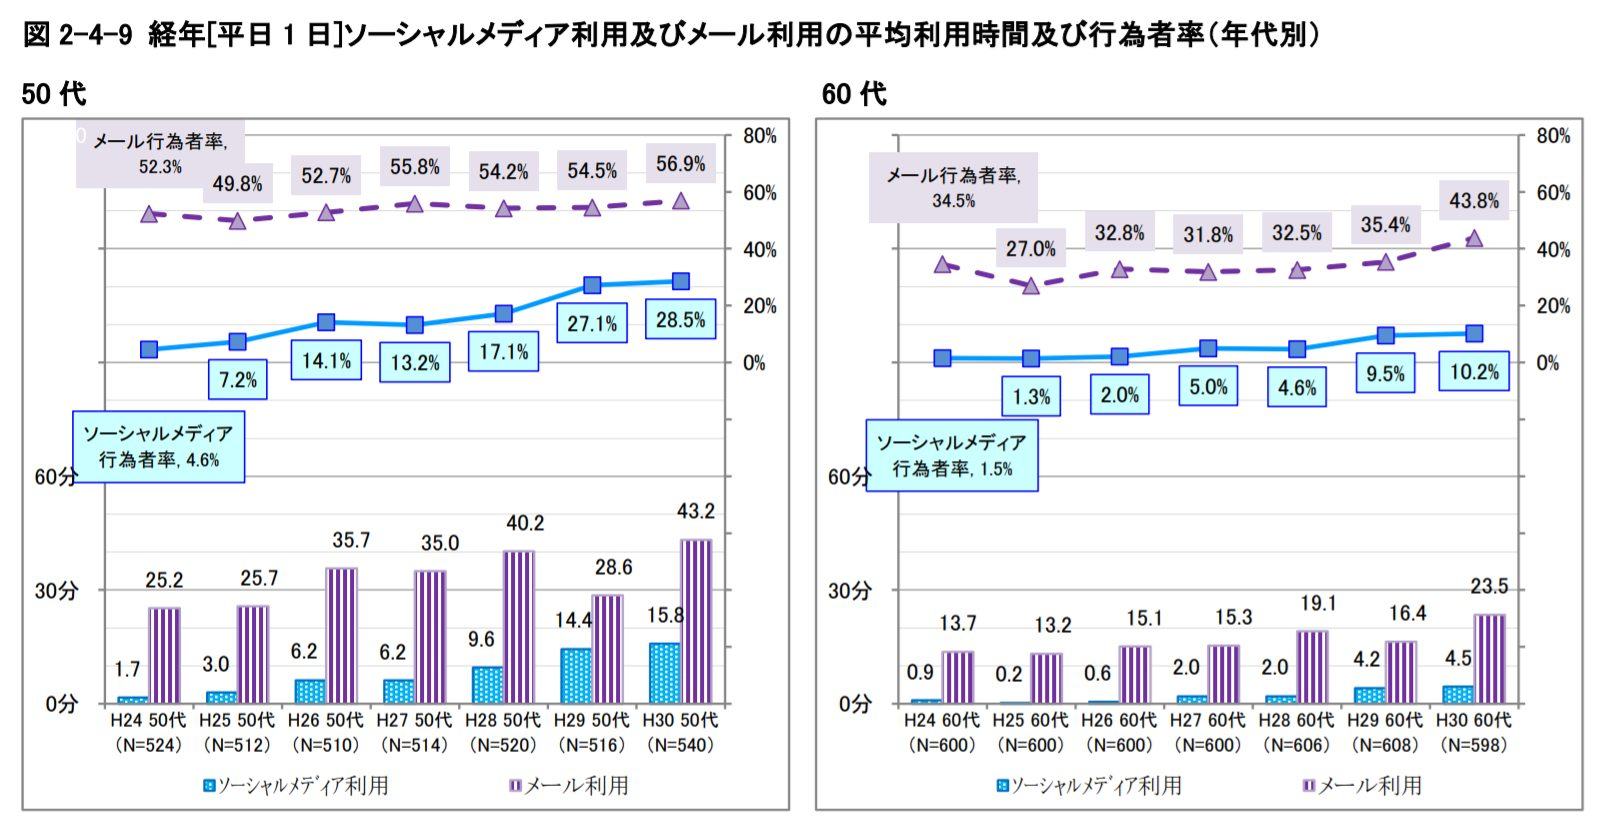 elderly-sns-statistics